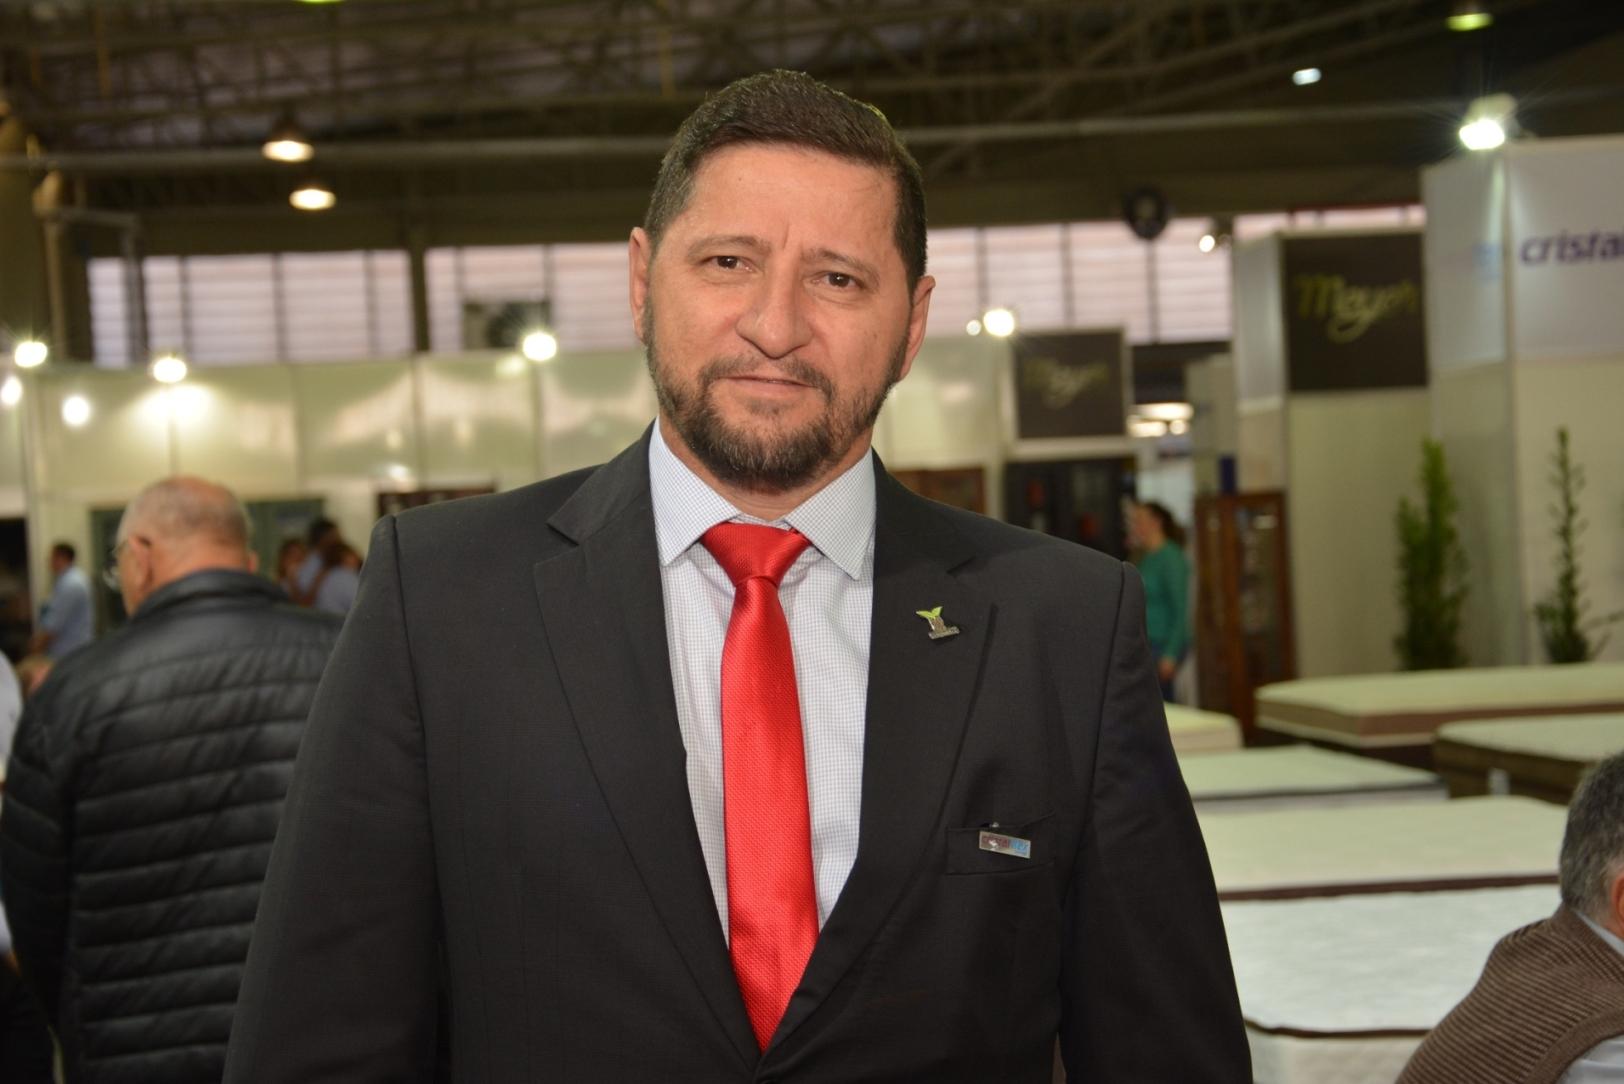 Presidente da feira, José Derli Cerveira, comemora os resultados obtidos